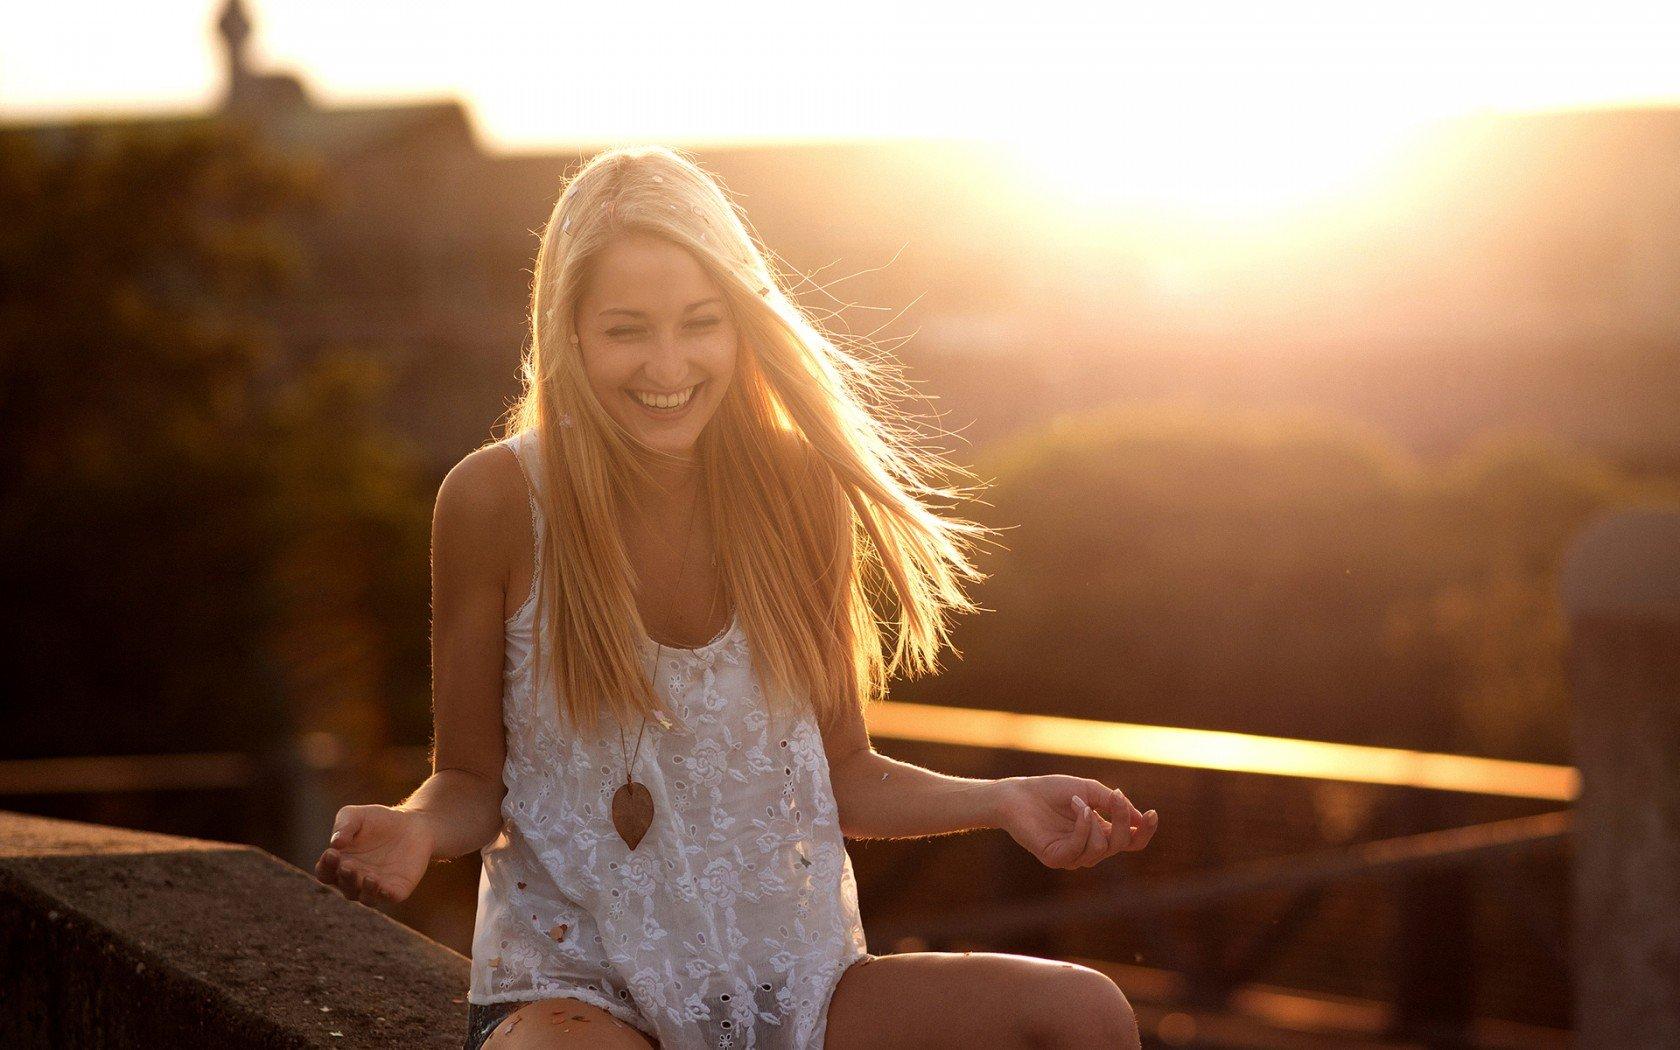 katrin-smeh-radost